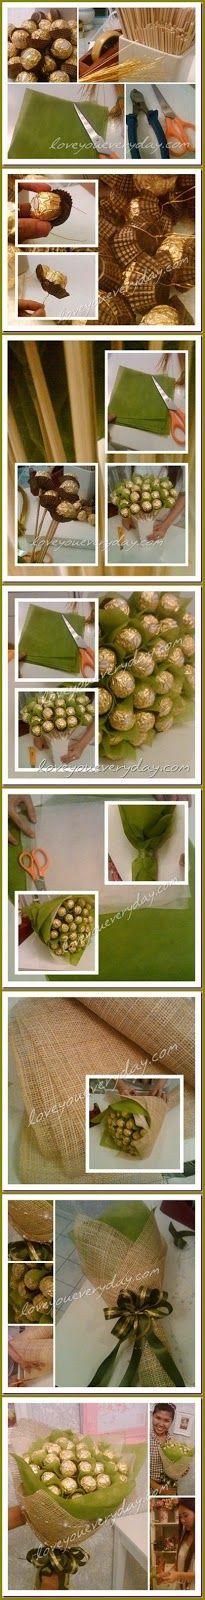 Campos de Trébol: Flores comestibles